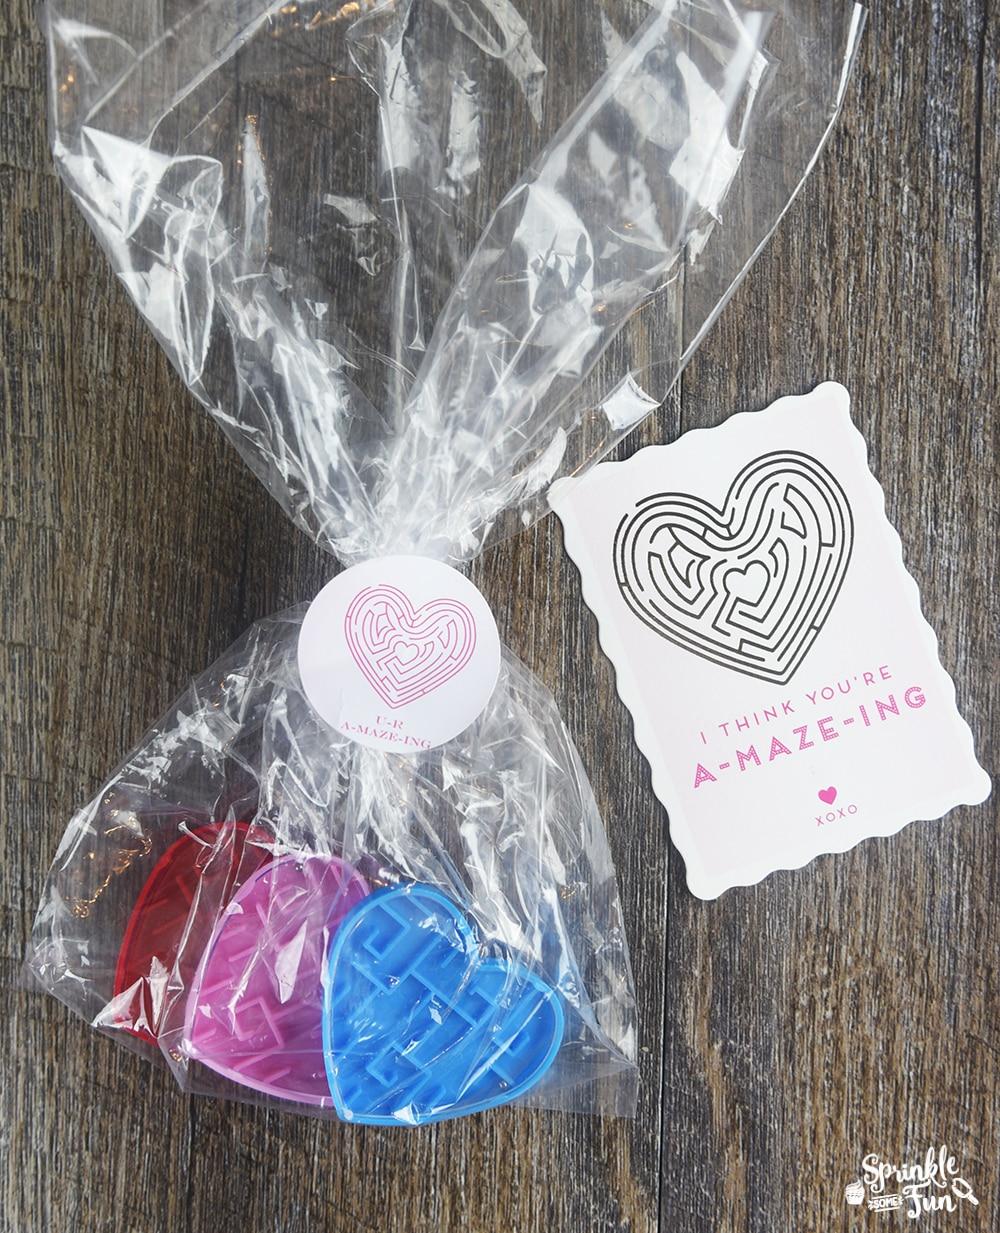 7 Super Cute Valentines! I think you're A-MAZE-ING, Valentine!